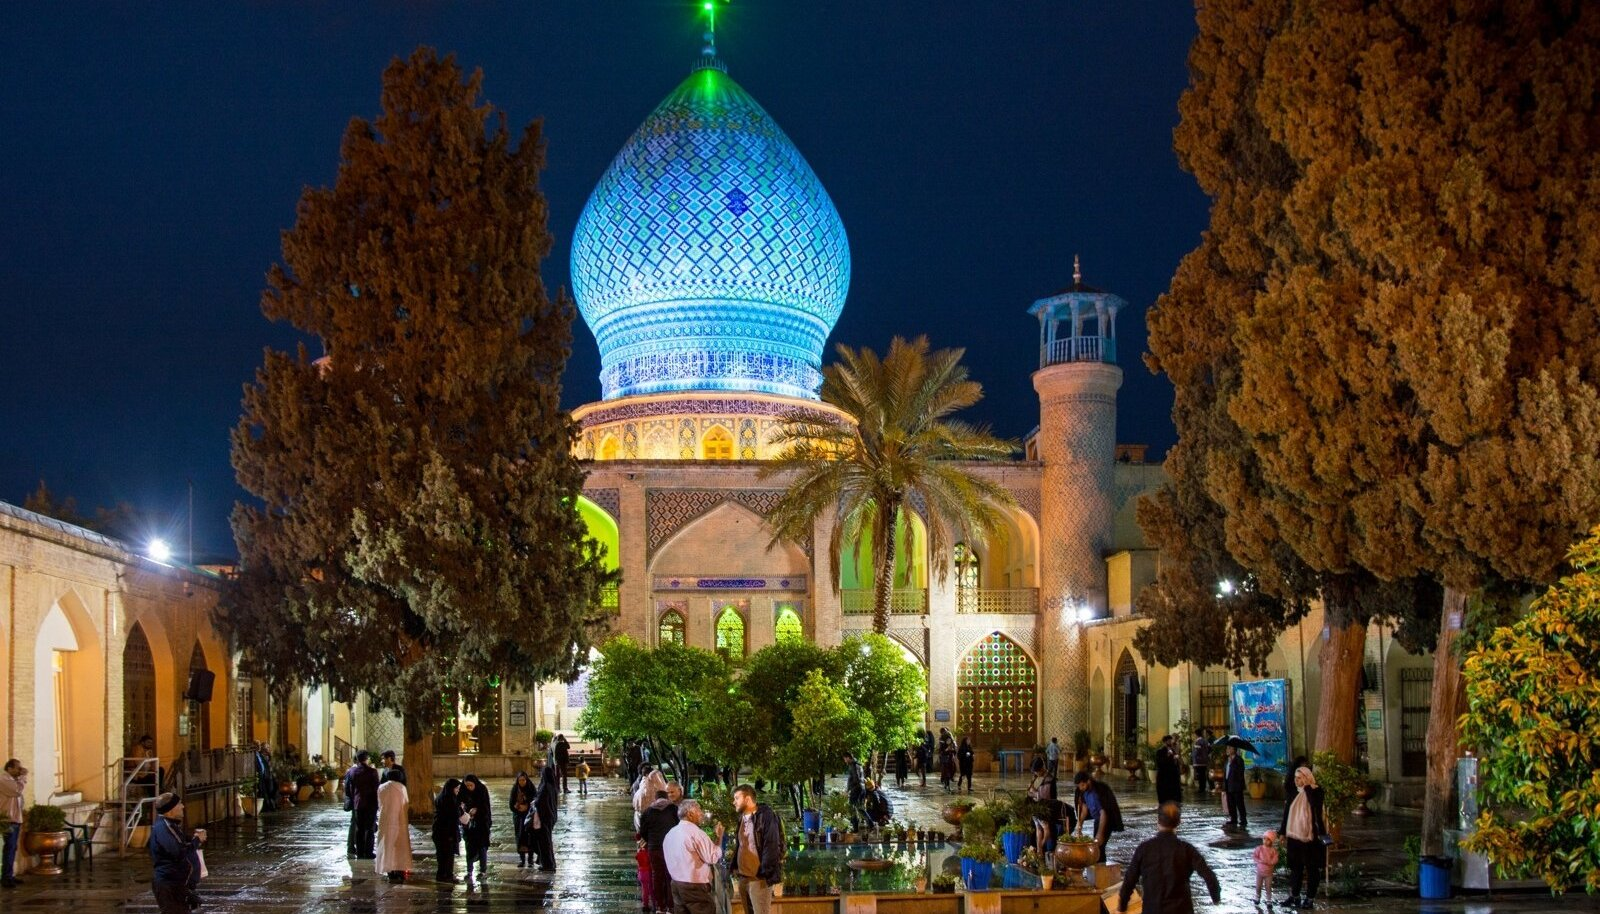 Arhitektuuri ilu keset Shirazi linna